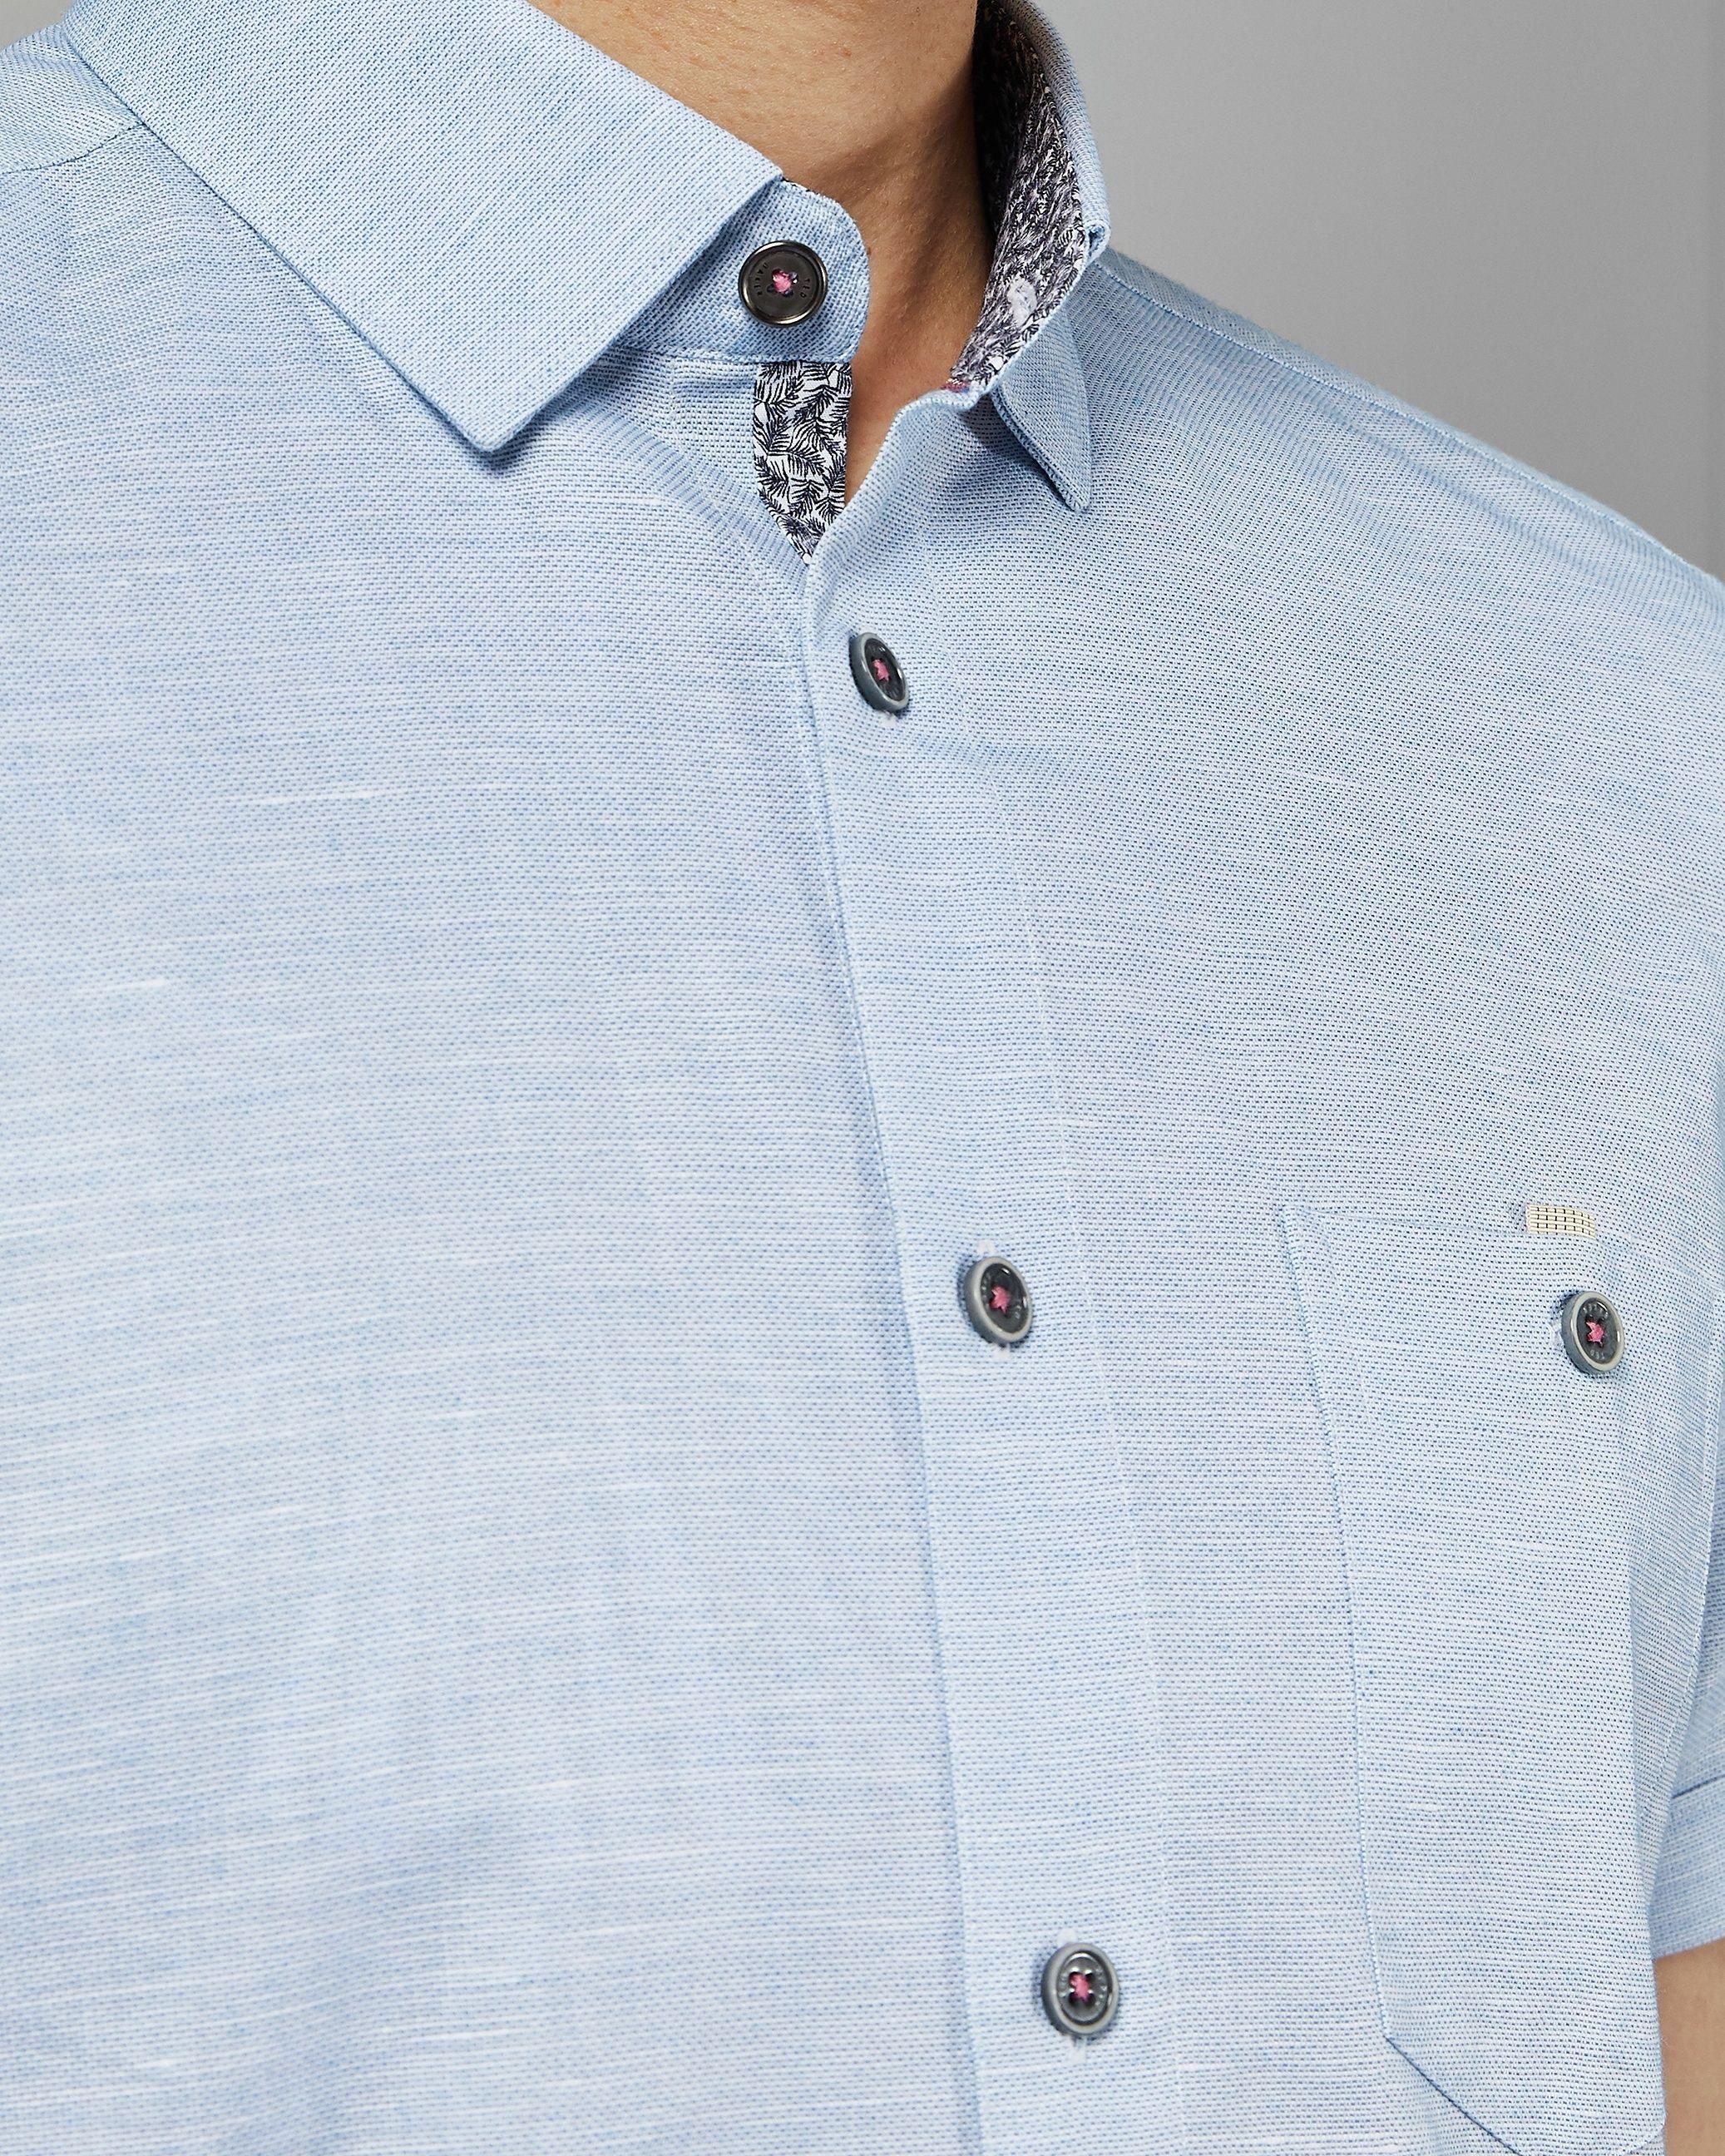 Ted Baker Clion Short-Sleeved Linen Shirt, Blue